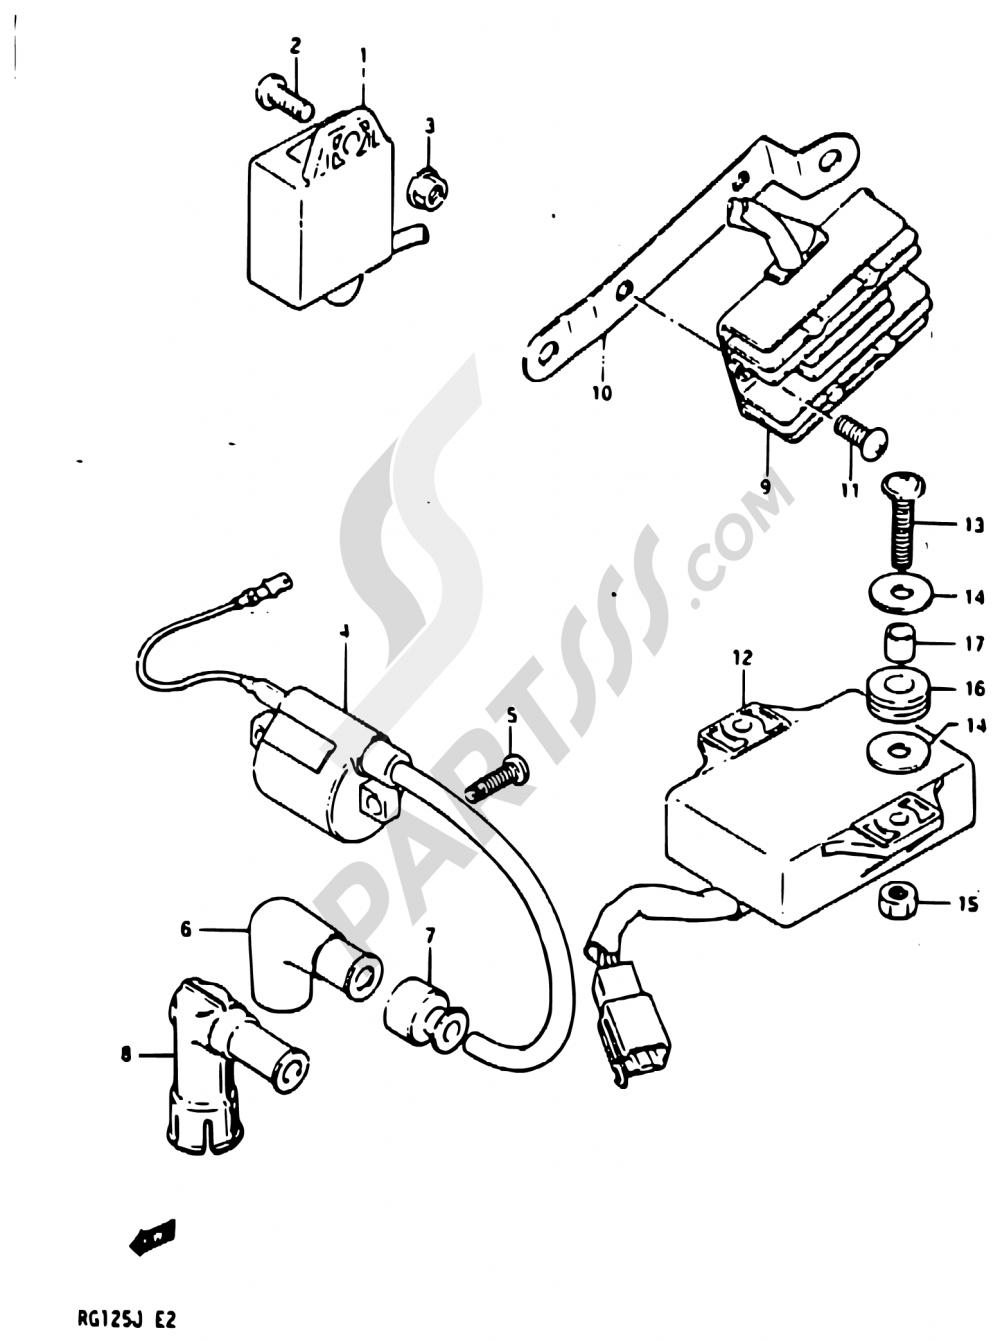 17 - ELECTRICAL Suzuki RG125A 1988